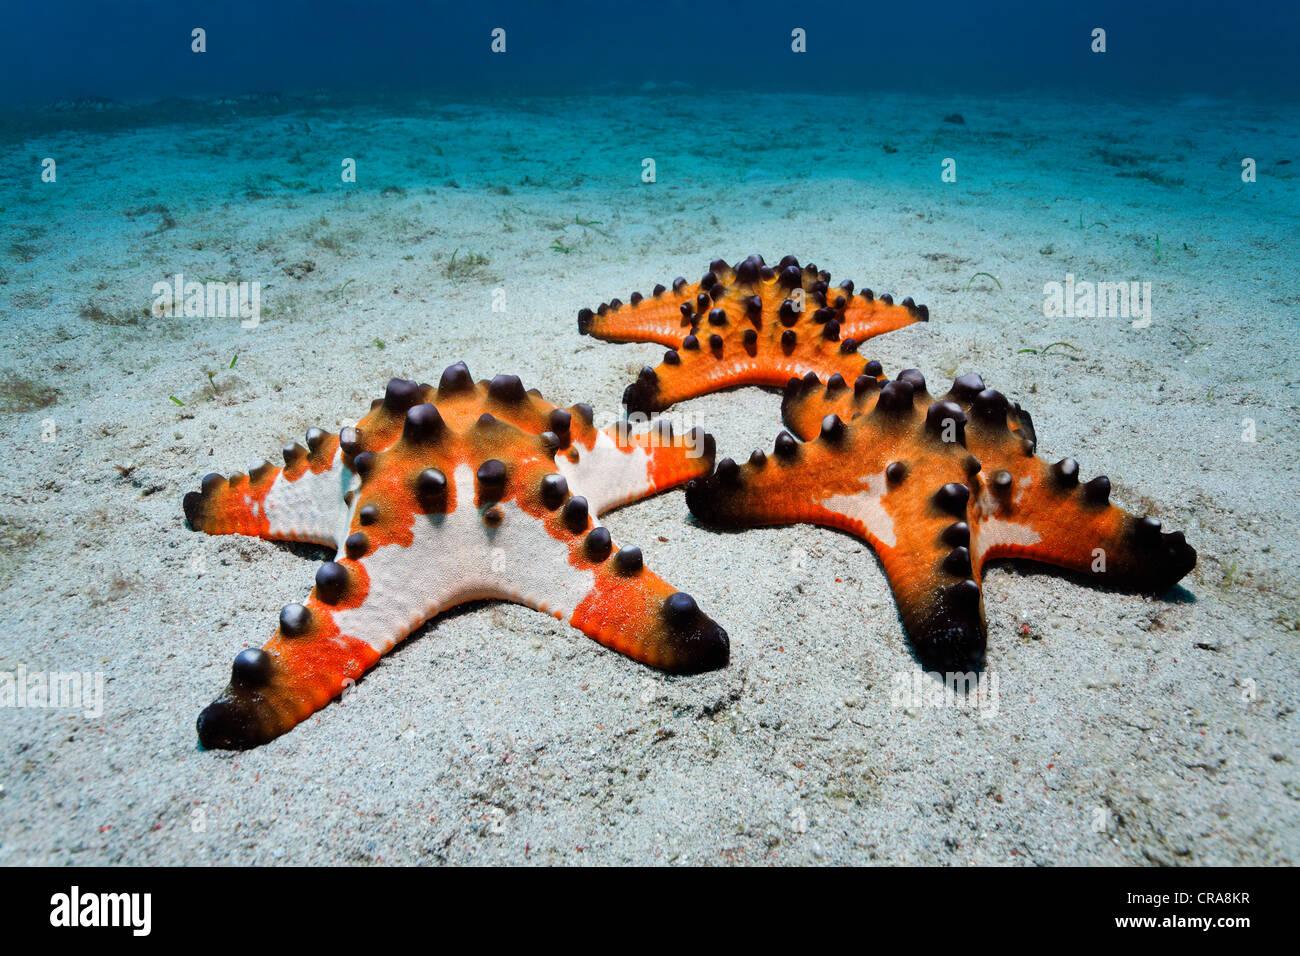 Chocolate Chip Starfish (Protoreaster nodosus) gathered on a sandy ...